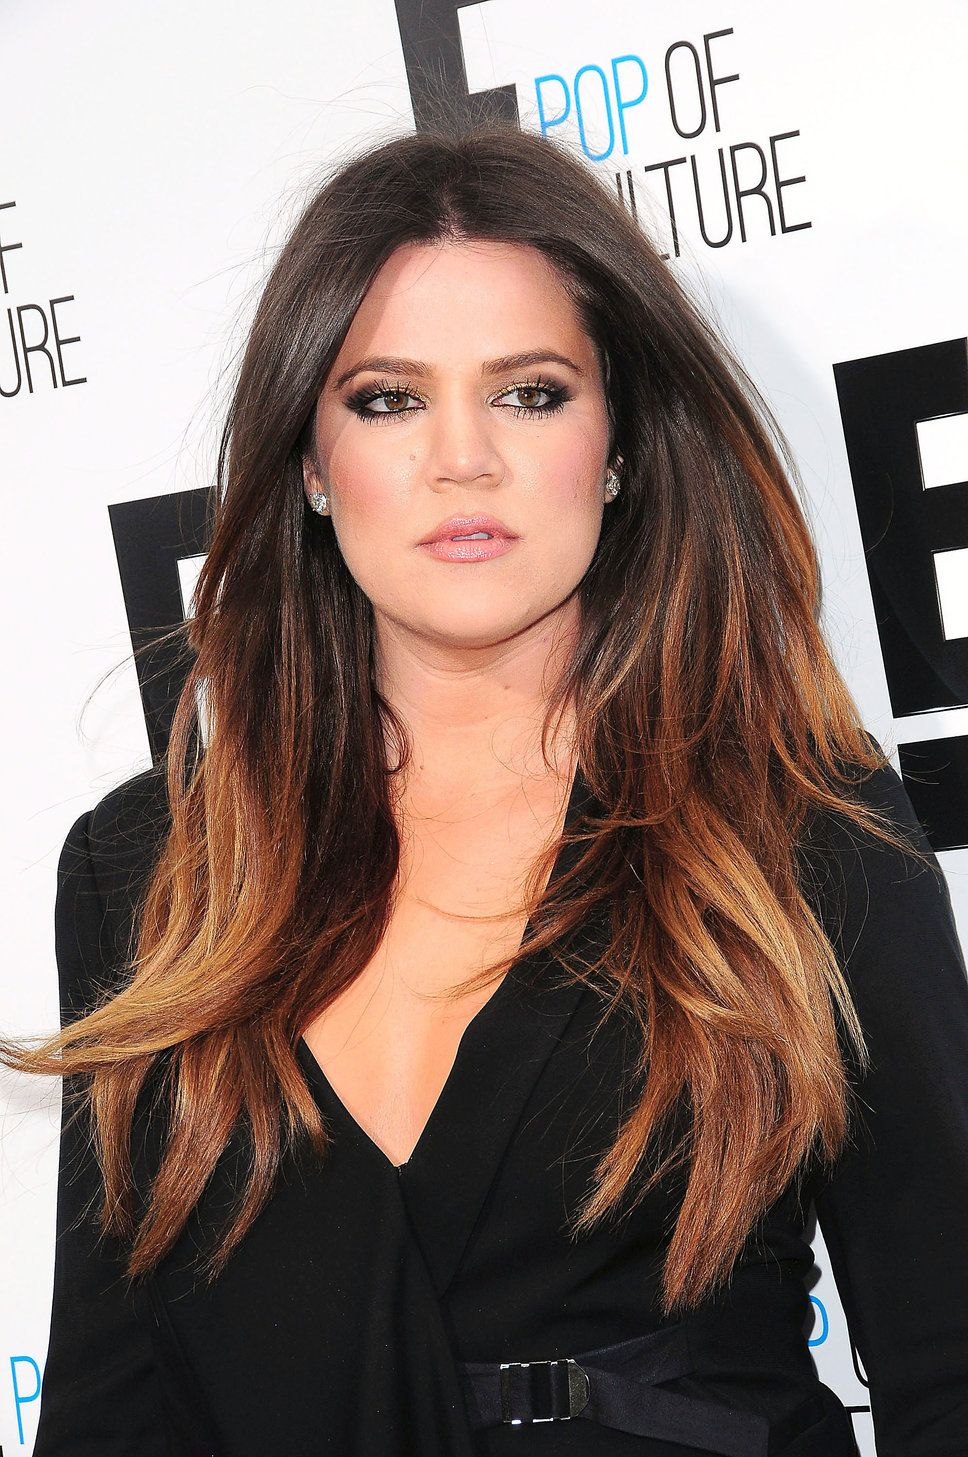 Colored Hair Extensions Khloe Kardashian Hair Extensions Video